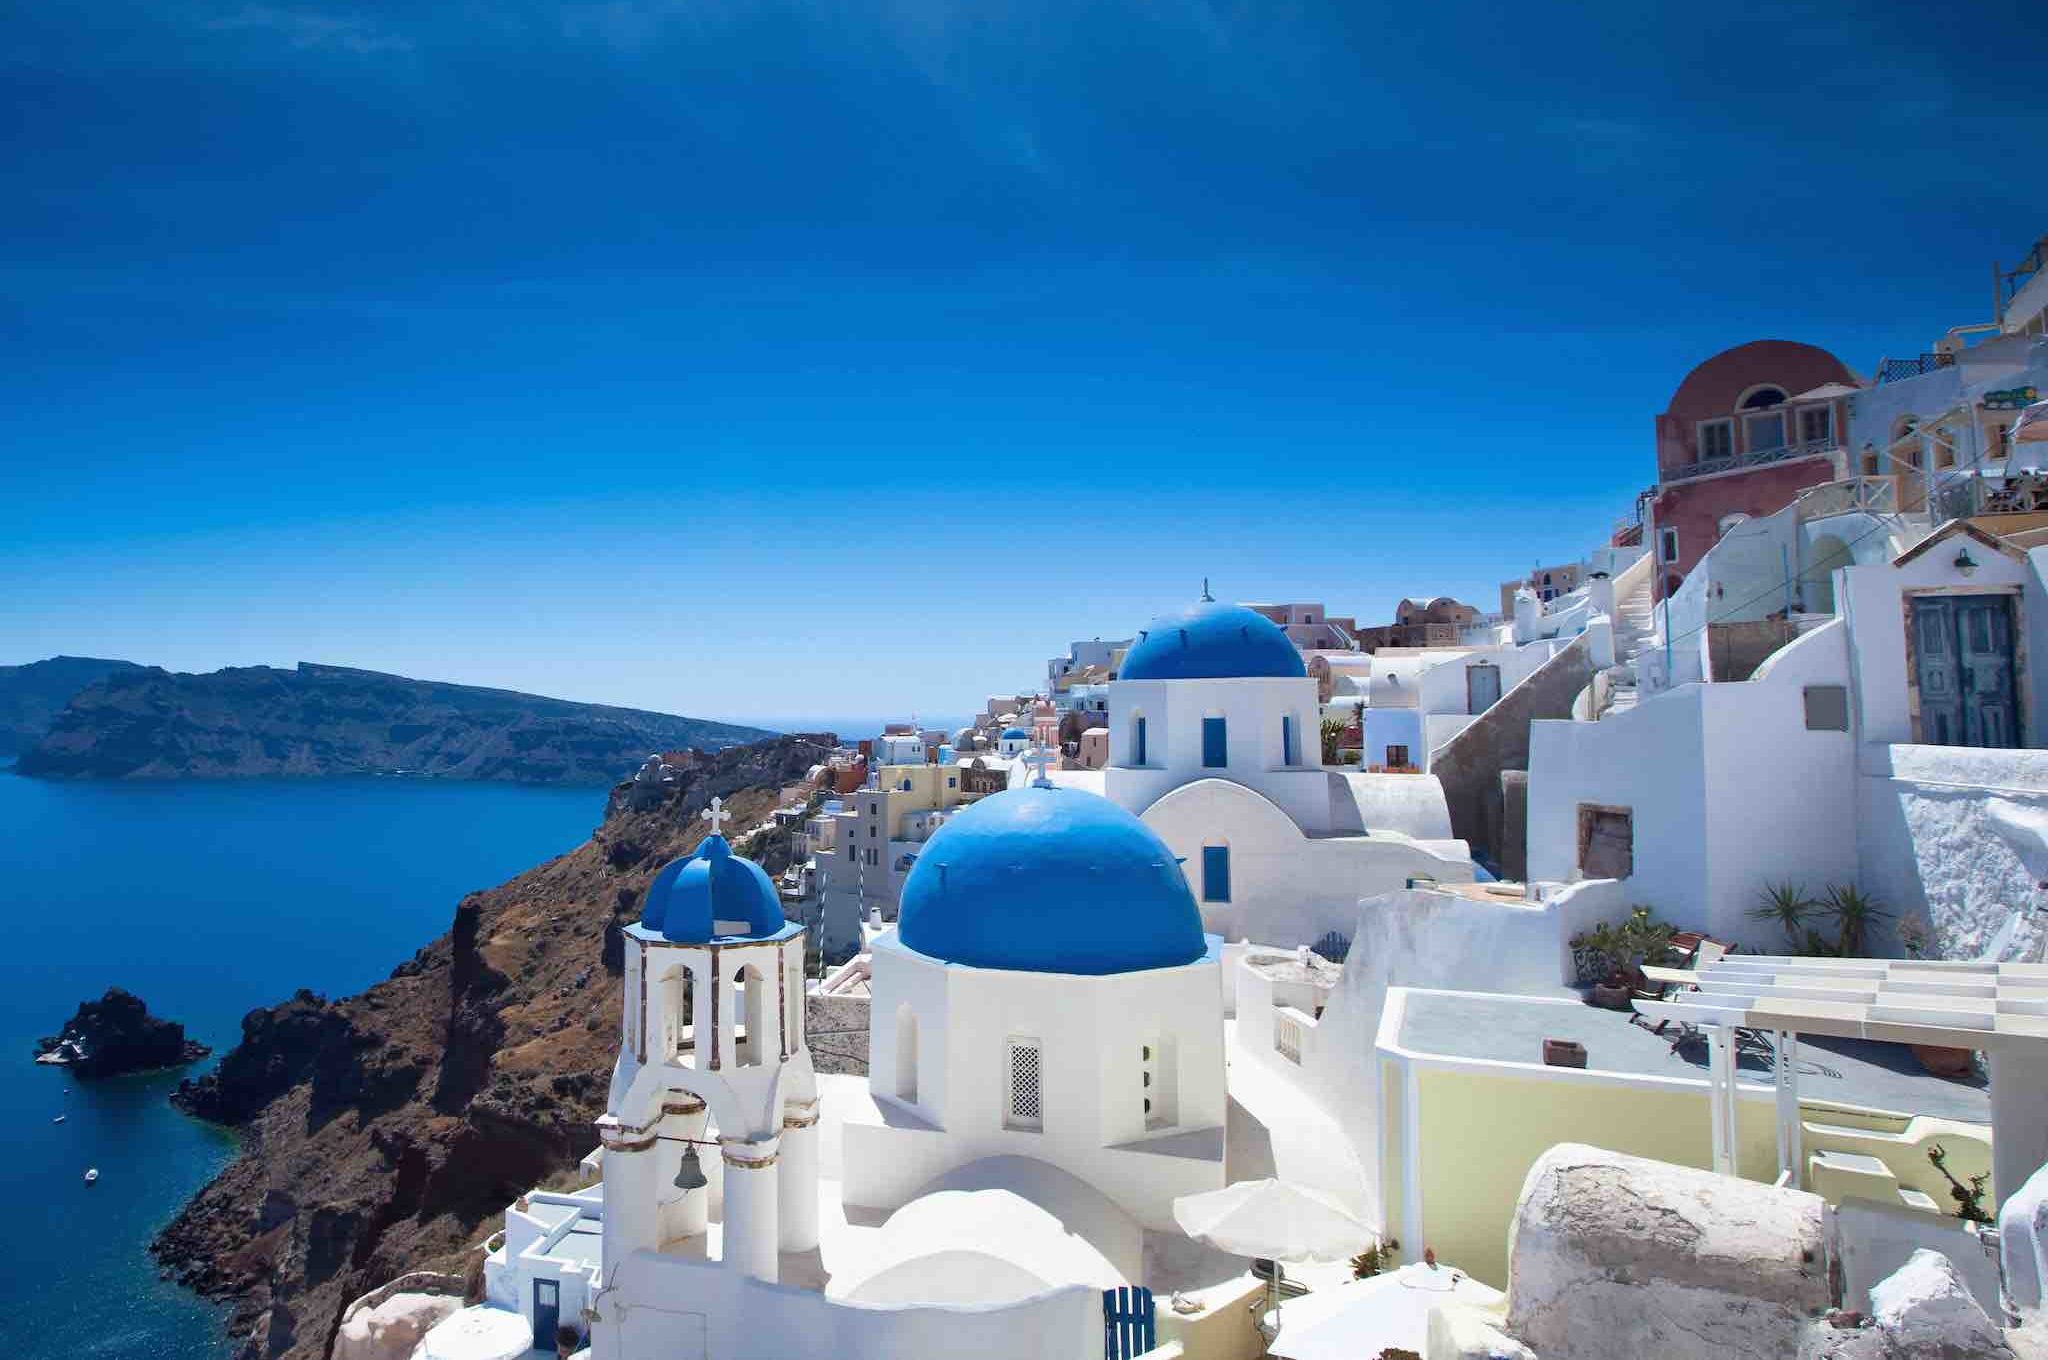 Aegean Airlines dessert 5 destinations en vols directs vers la Grèce